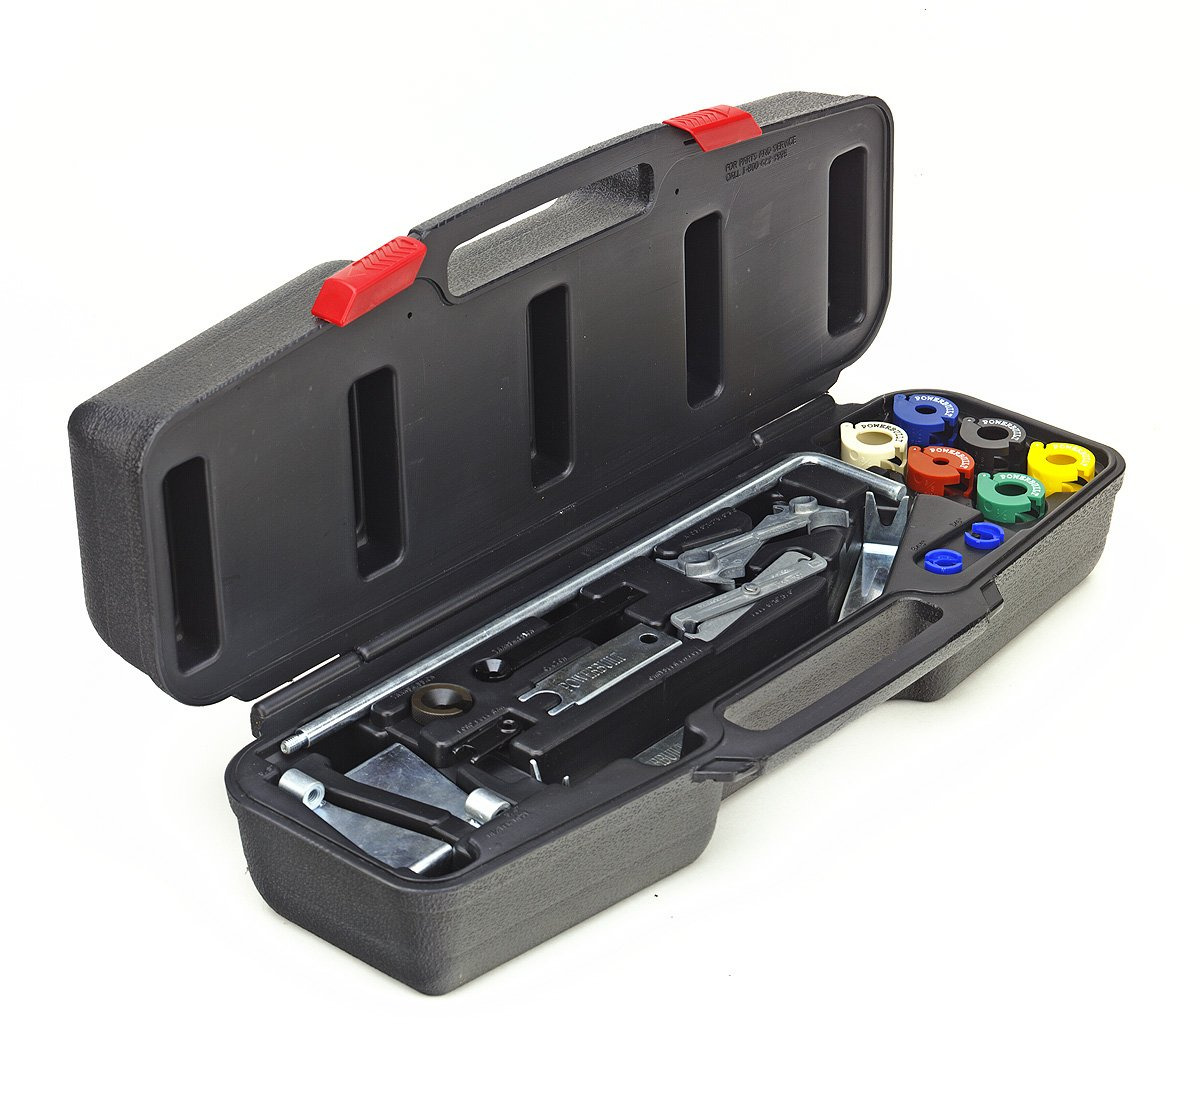 Powerbuilt Alltrade 648727 Kit 22 Master Disconnect Tool Set